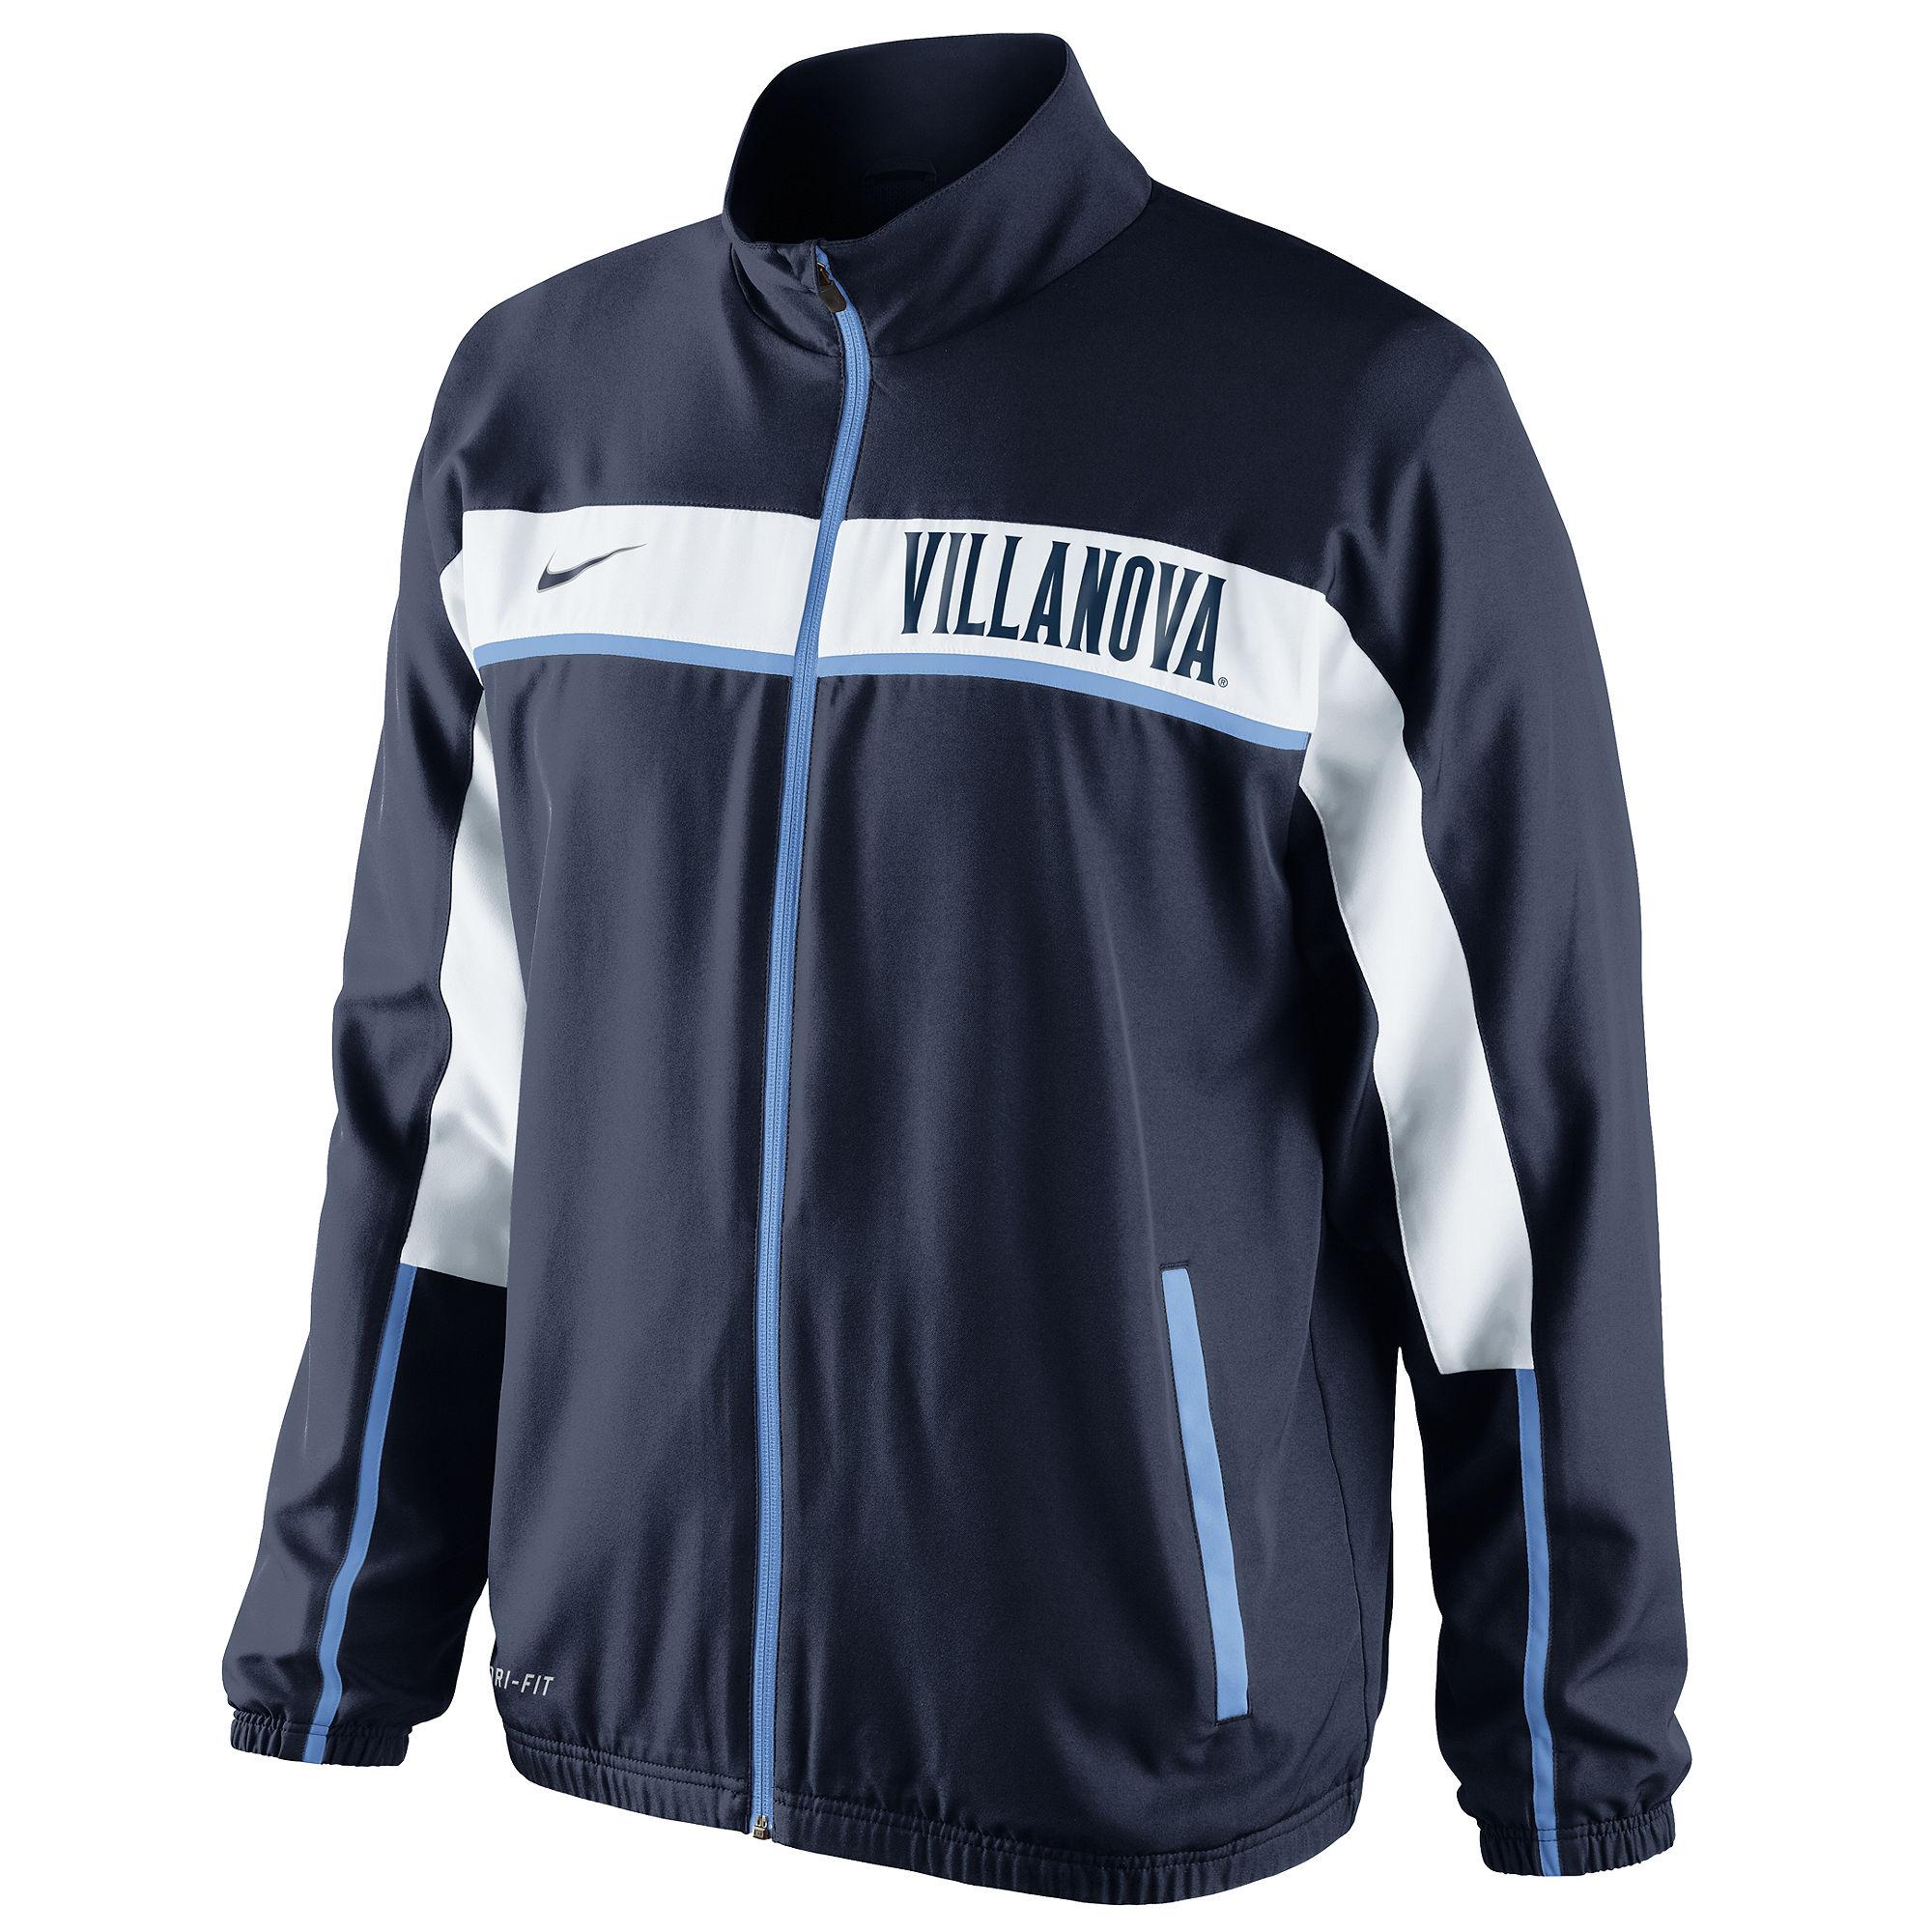 bfe9679cd9c2 Lyst - Nike Villanova Wildcats Basketball Game Jacket in Black for Men